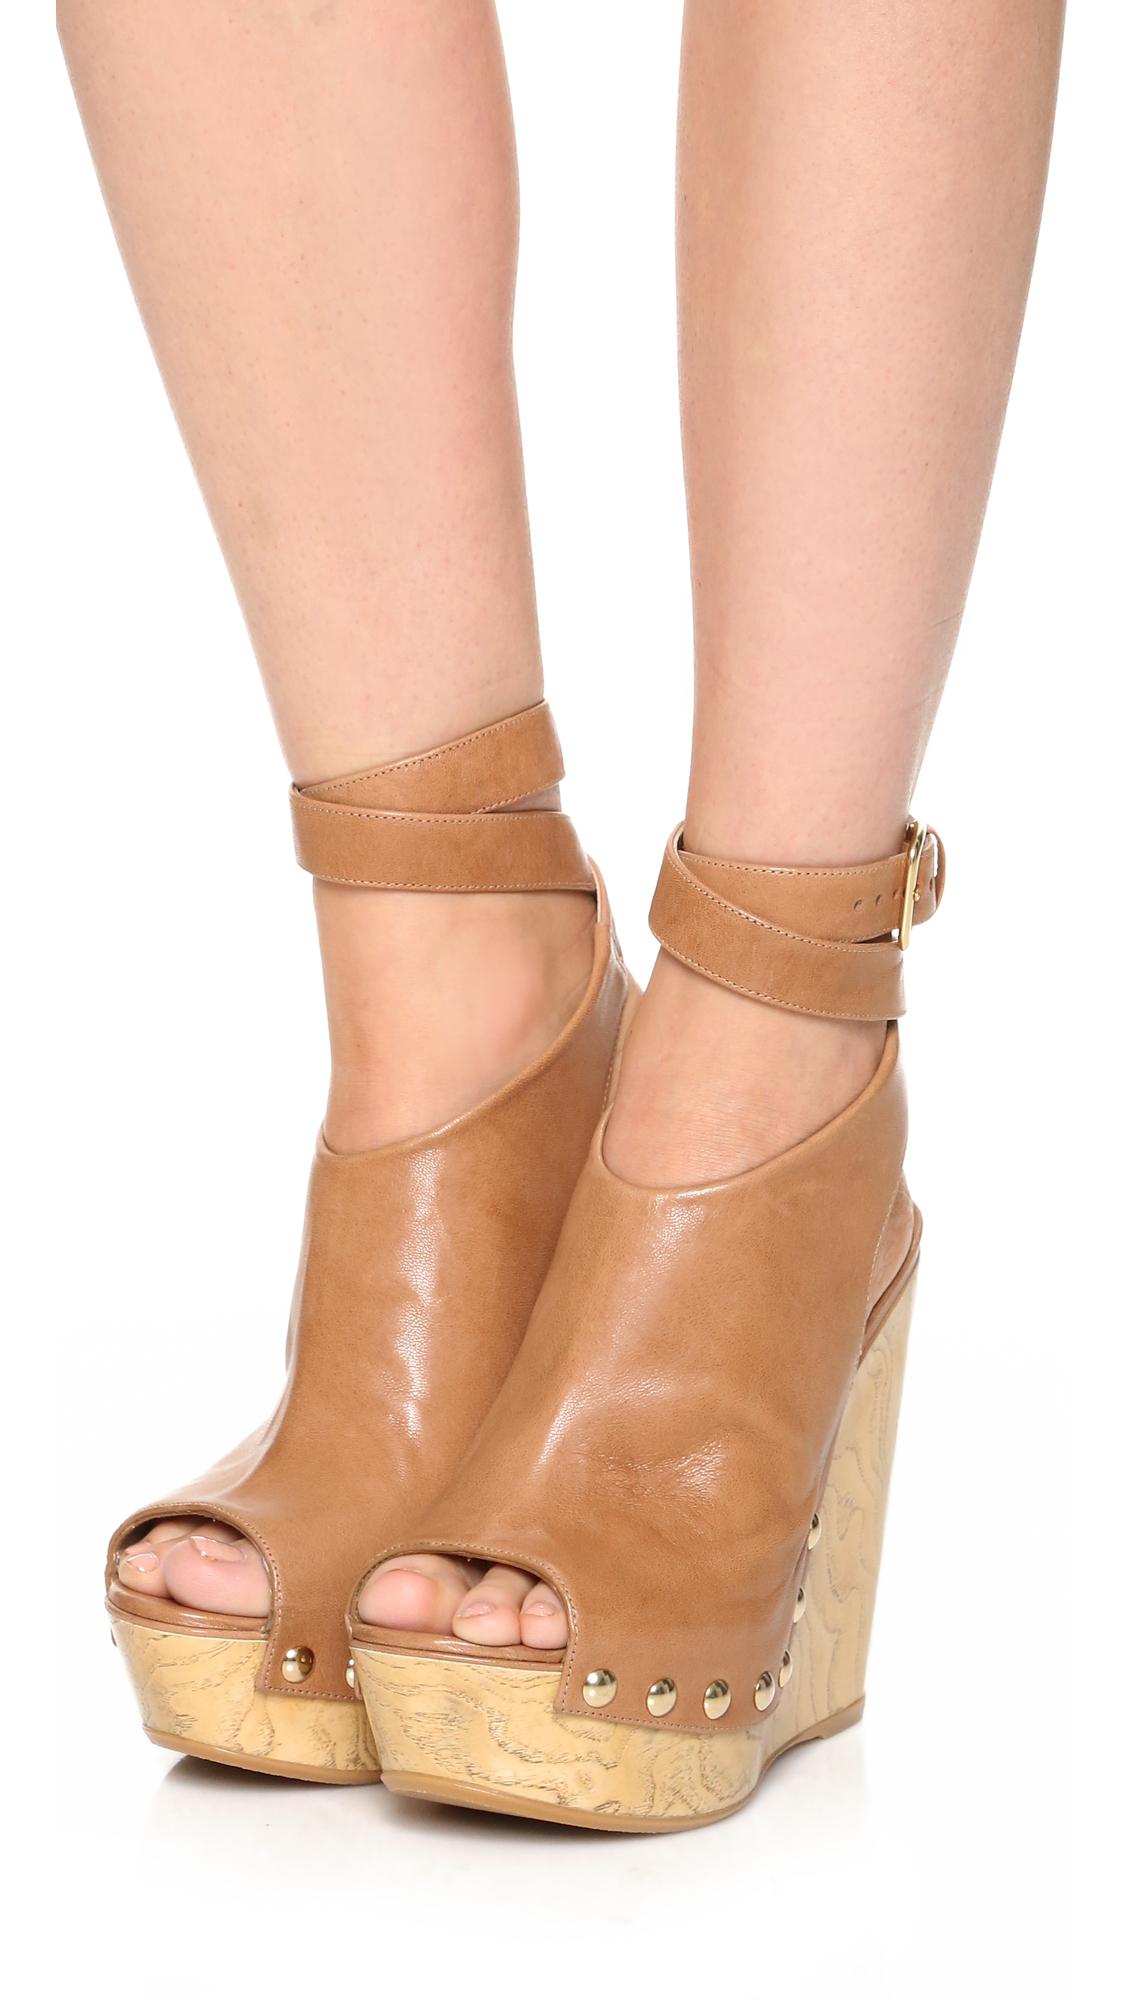 Stuart Weitzman Leather Platform Sandals best seller sale online ZnRncL